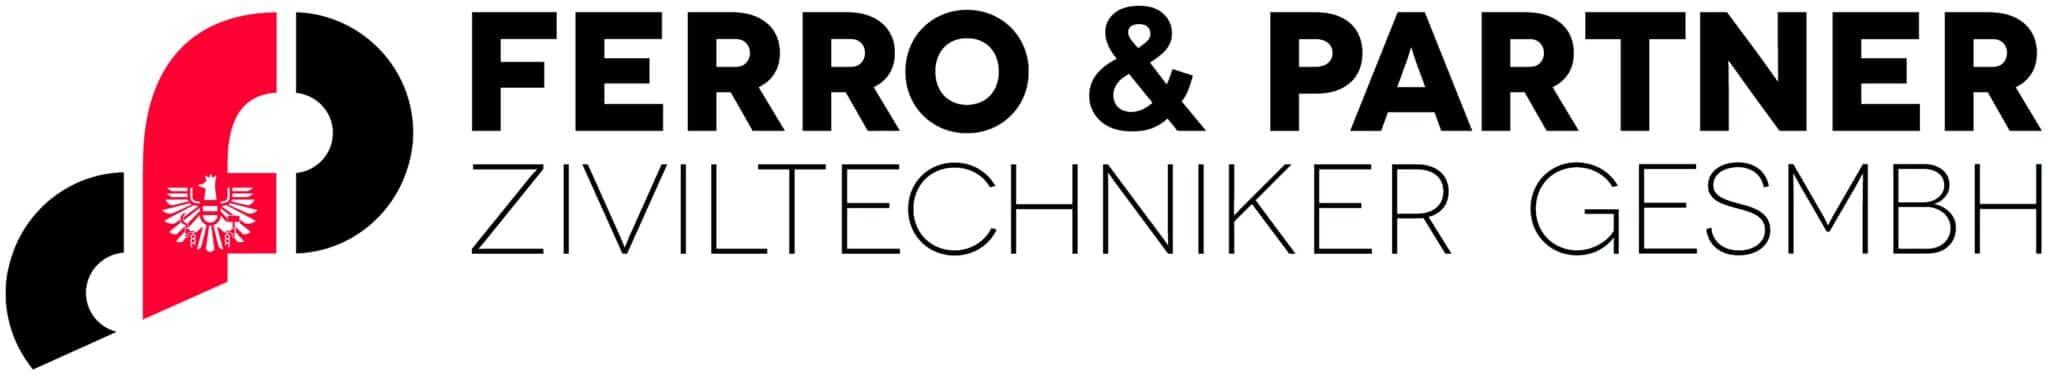 Logo Ferro & Partner